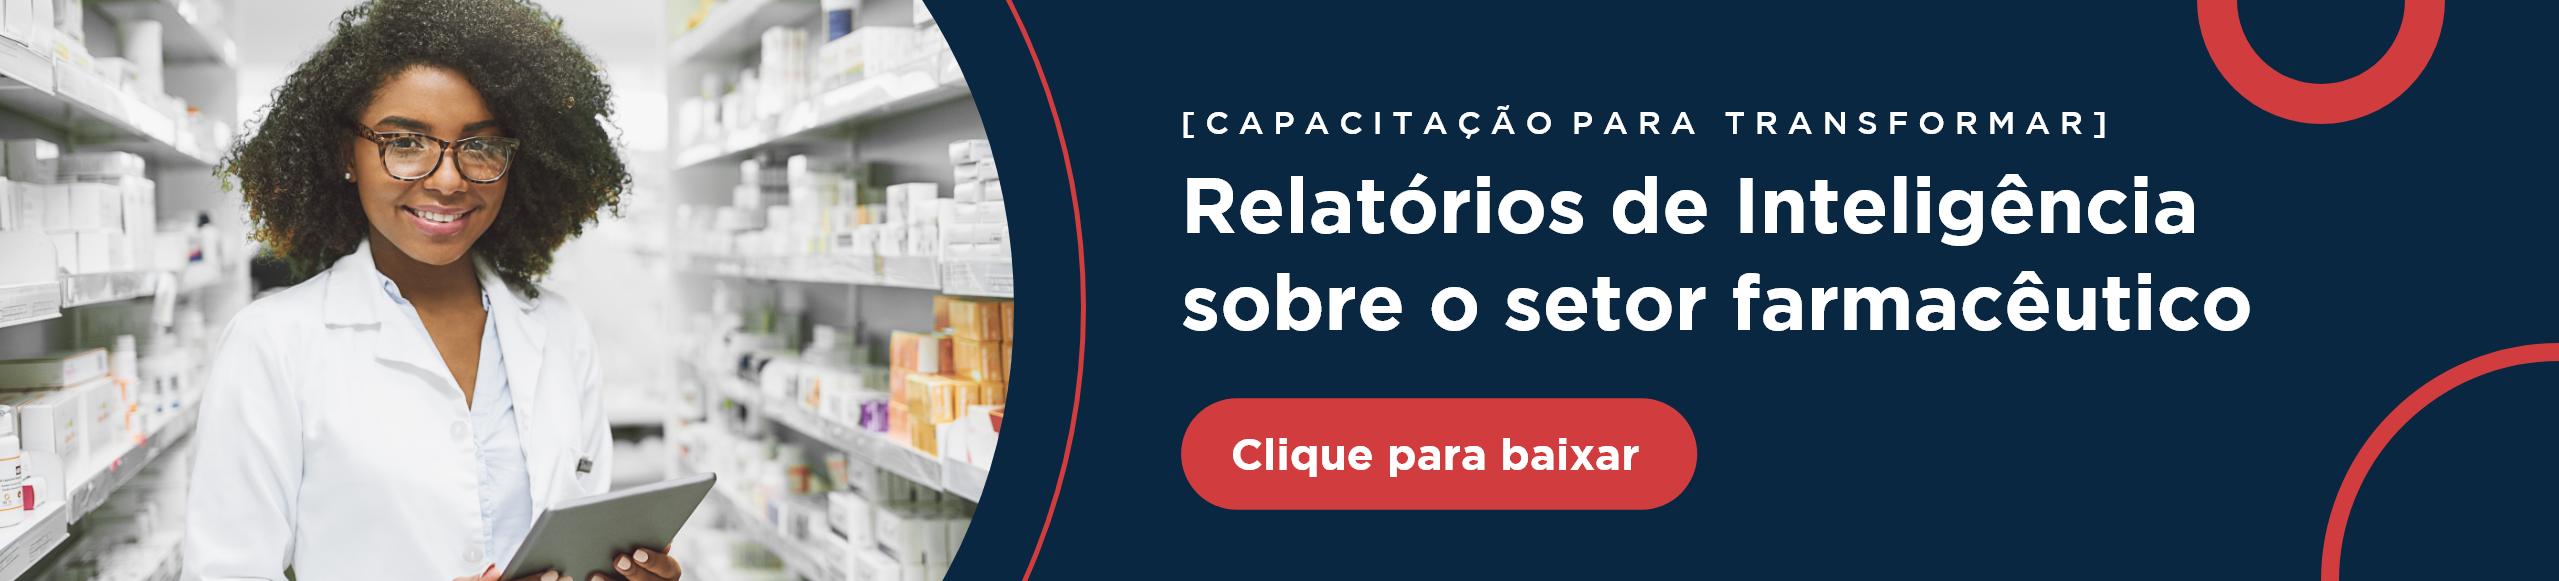 blog-dotcm-os-novos-tempos-da-capacitacao-digital-no-setor-farmaceutico-relatorios-de-inteligencia